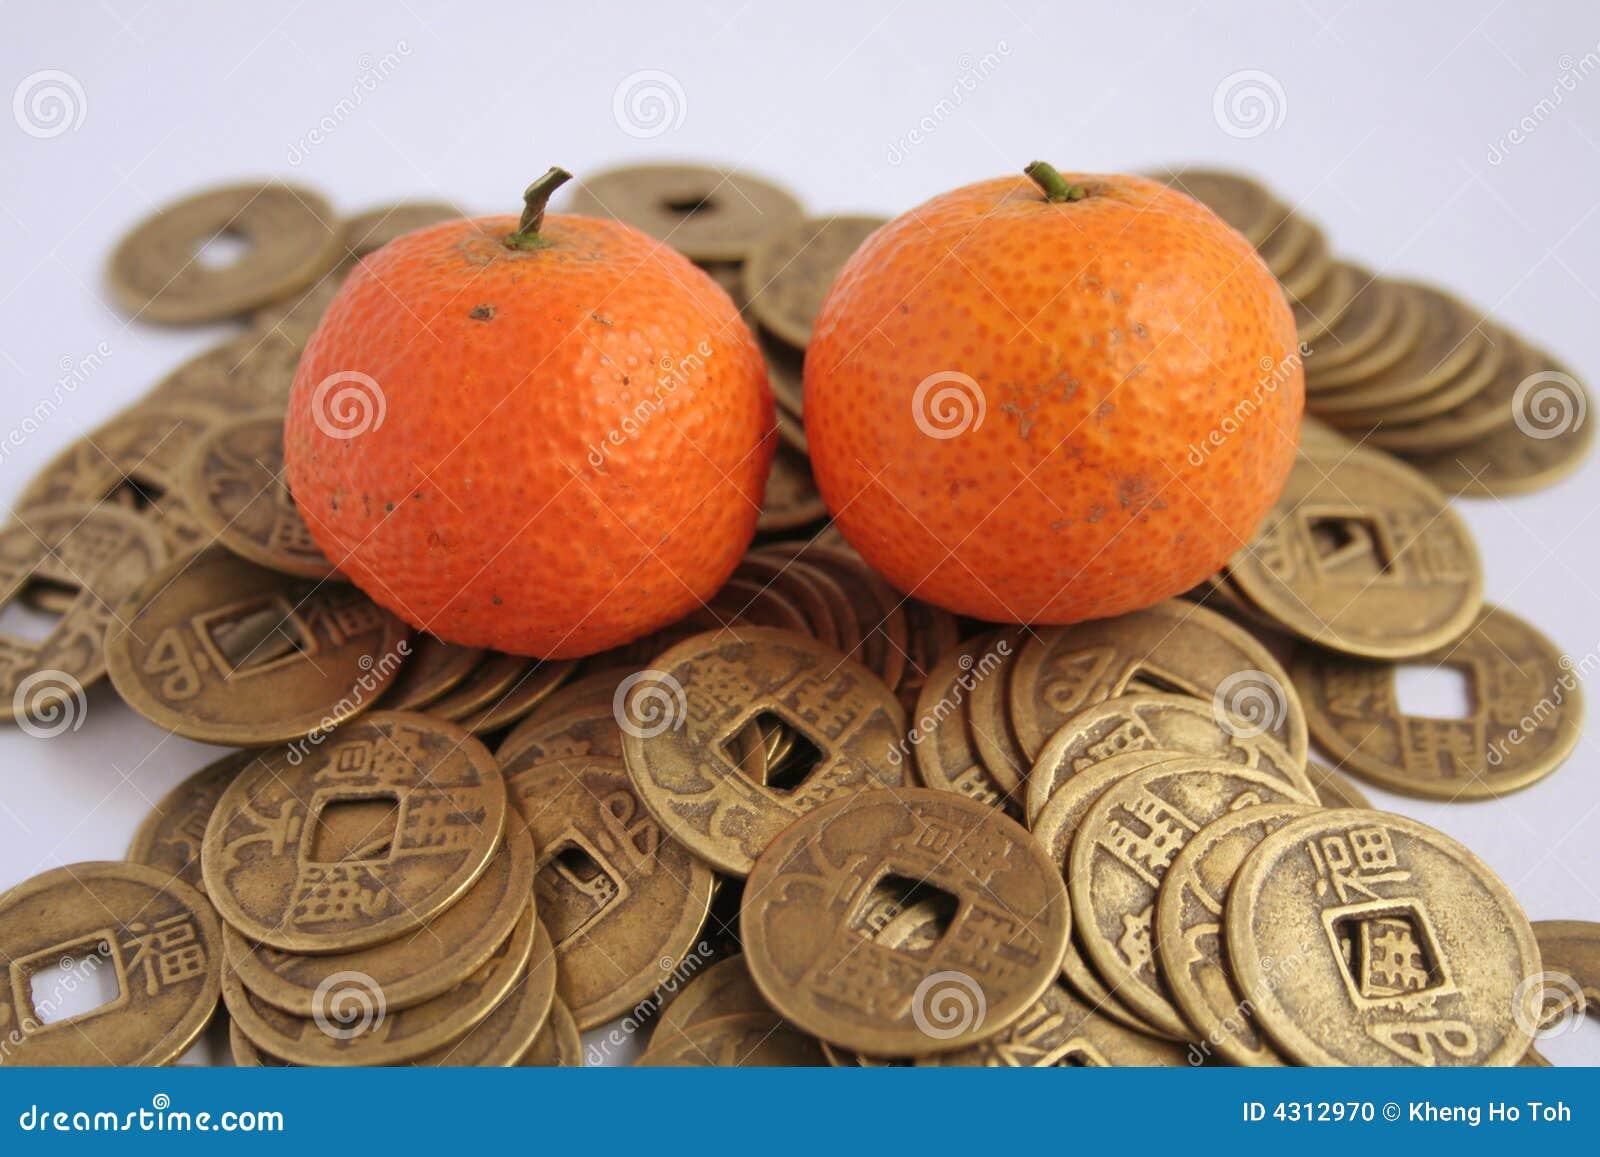 Asian Symbols Of Wealth Stock Photo Image Of Prosperity 4312970